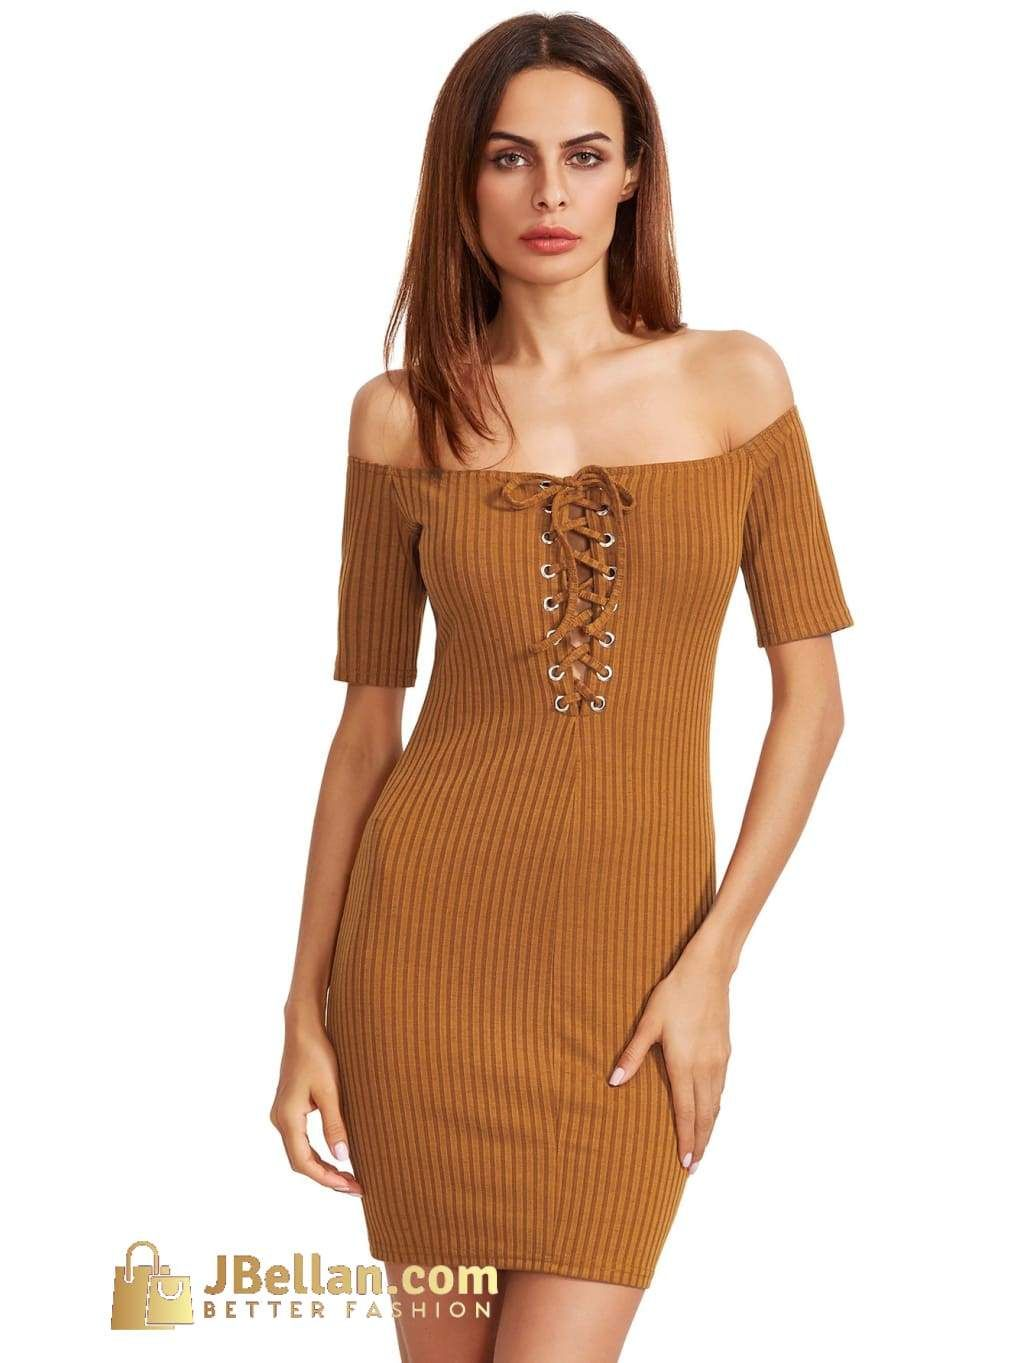 3afcdcf83ab9 Mustard Bardot Lace Up Bodycon Dress